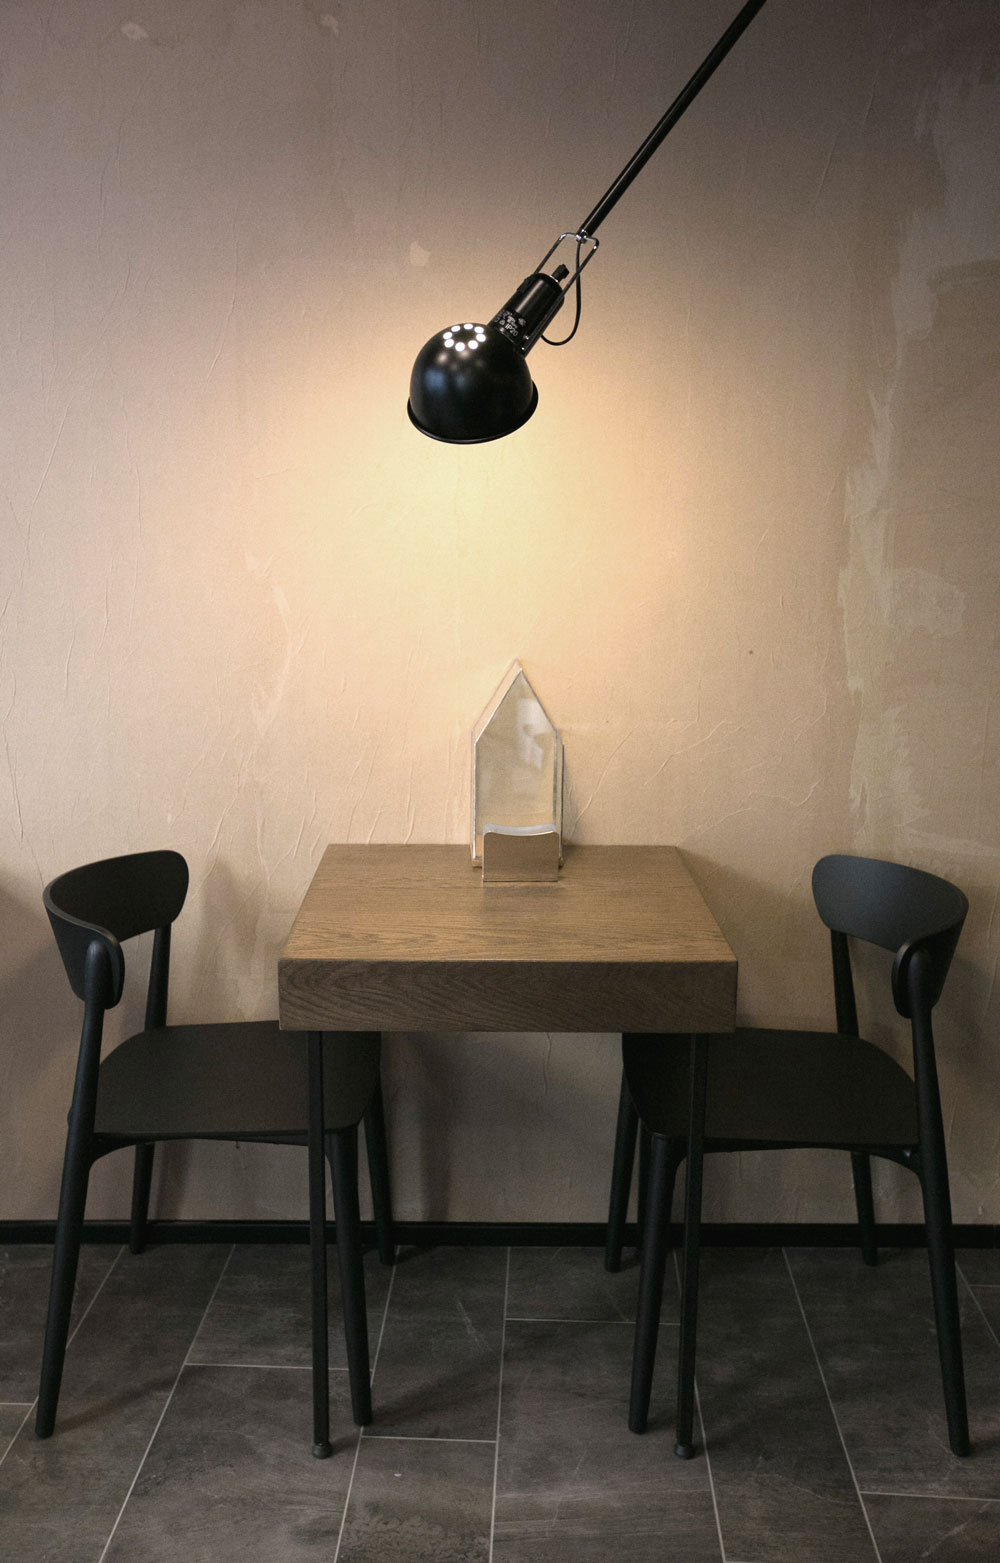 arredamento-bar-caffetteria-sedie-tavolo-lampada